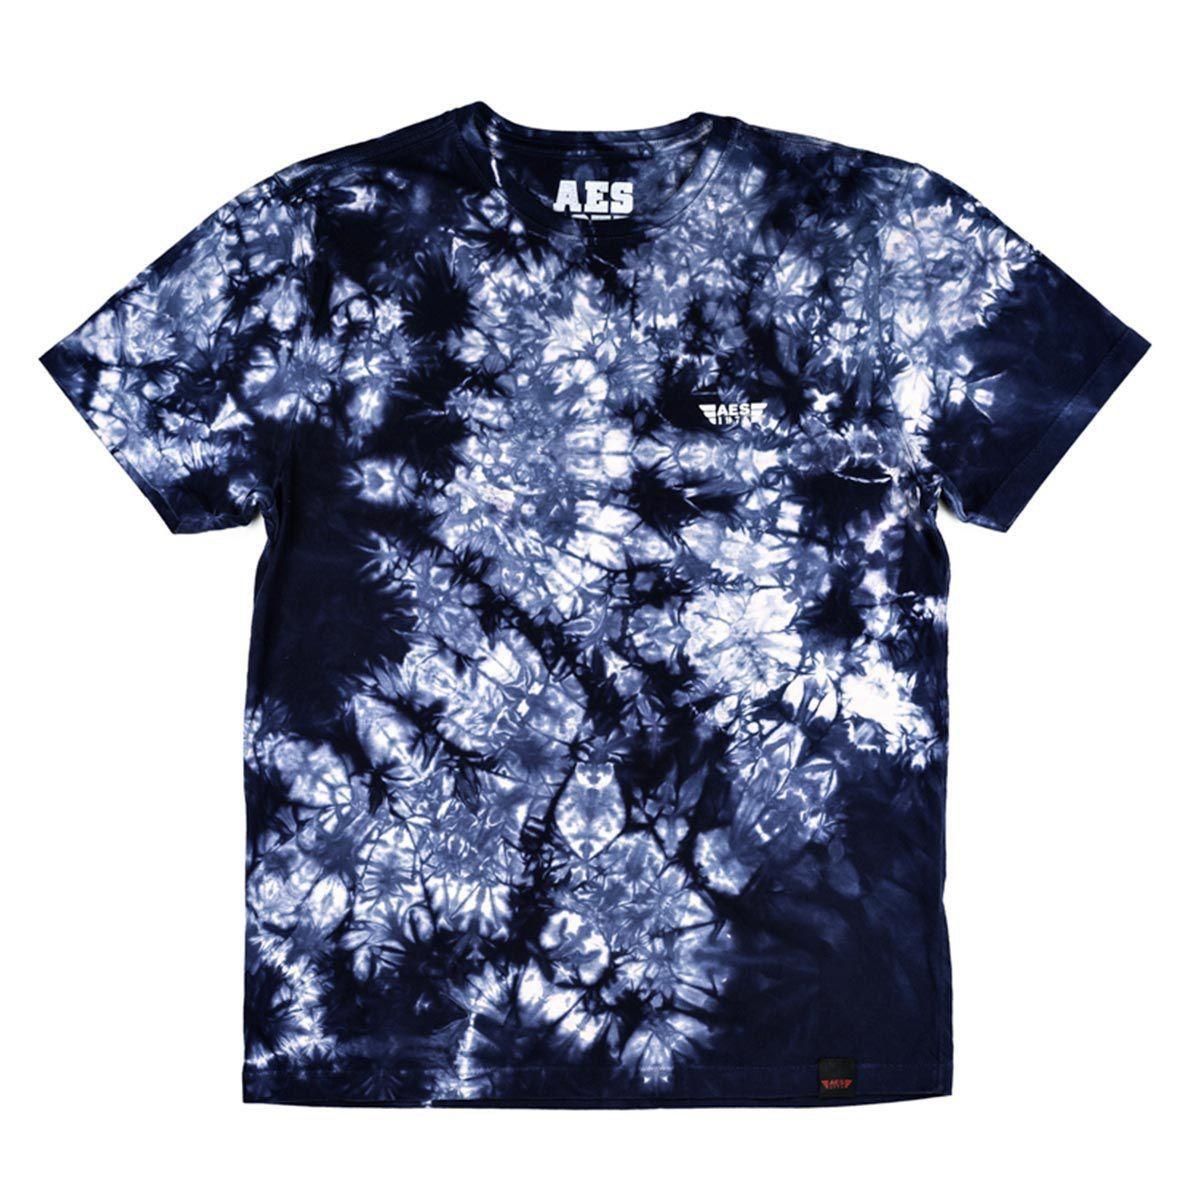 Camiseta AES 1975 Tie Dye Masculina - Azul